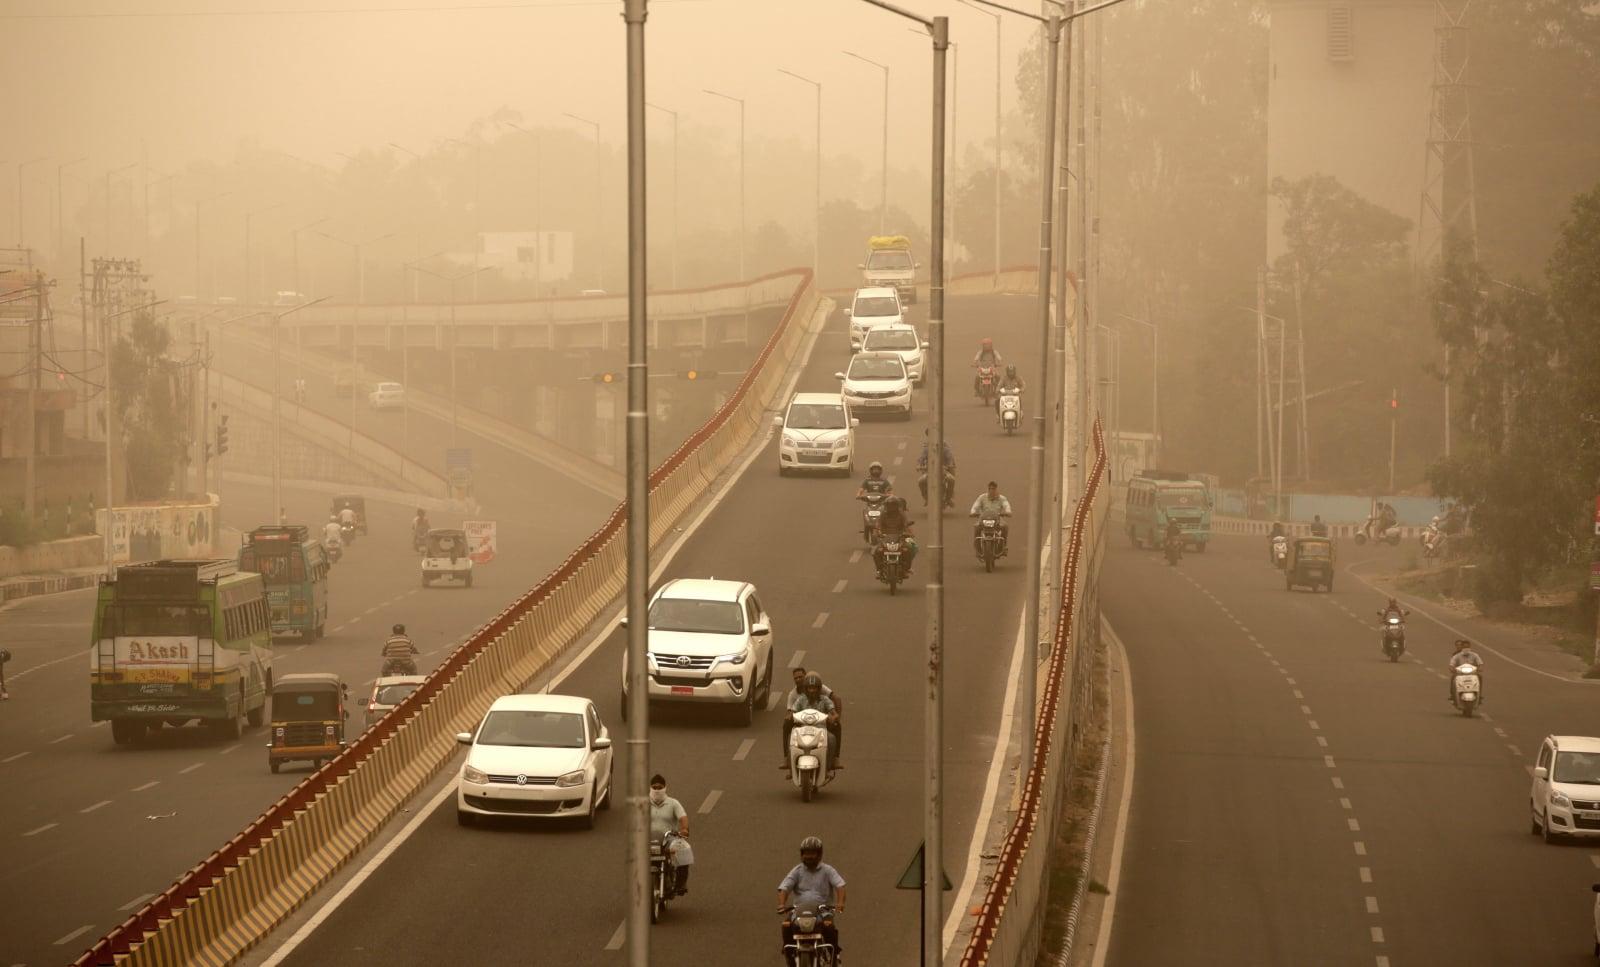 Panorama Indii fot. EPA/JAIPAL SINGH Dostawca: PAP/EPA.